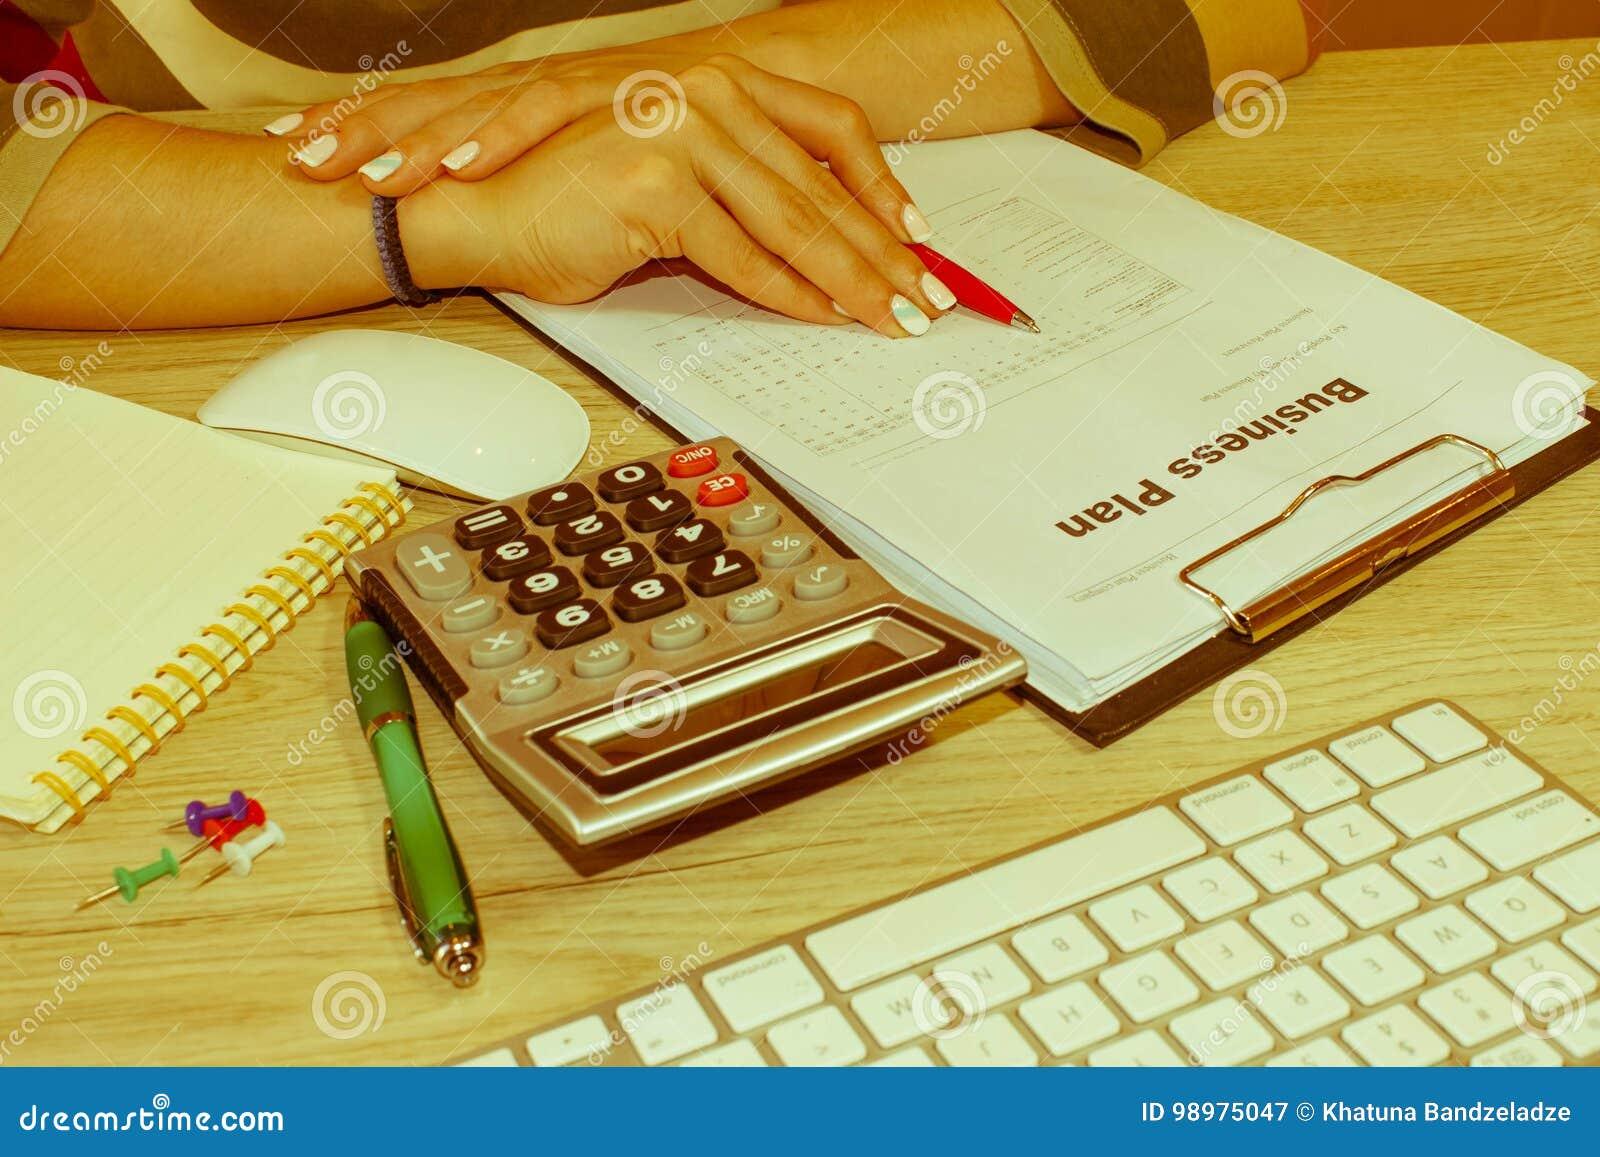 Business plan help desk